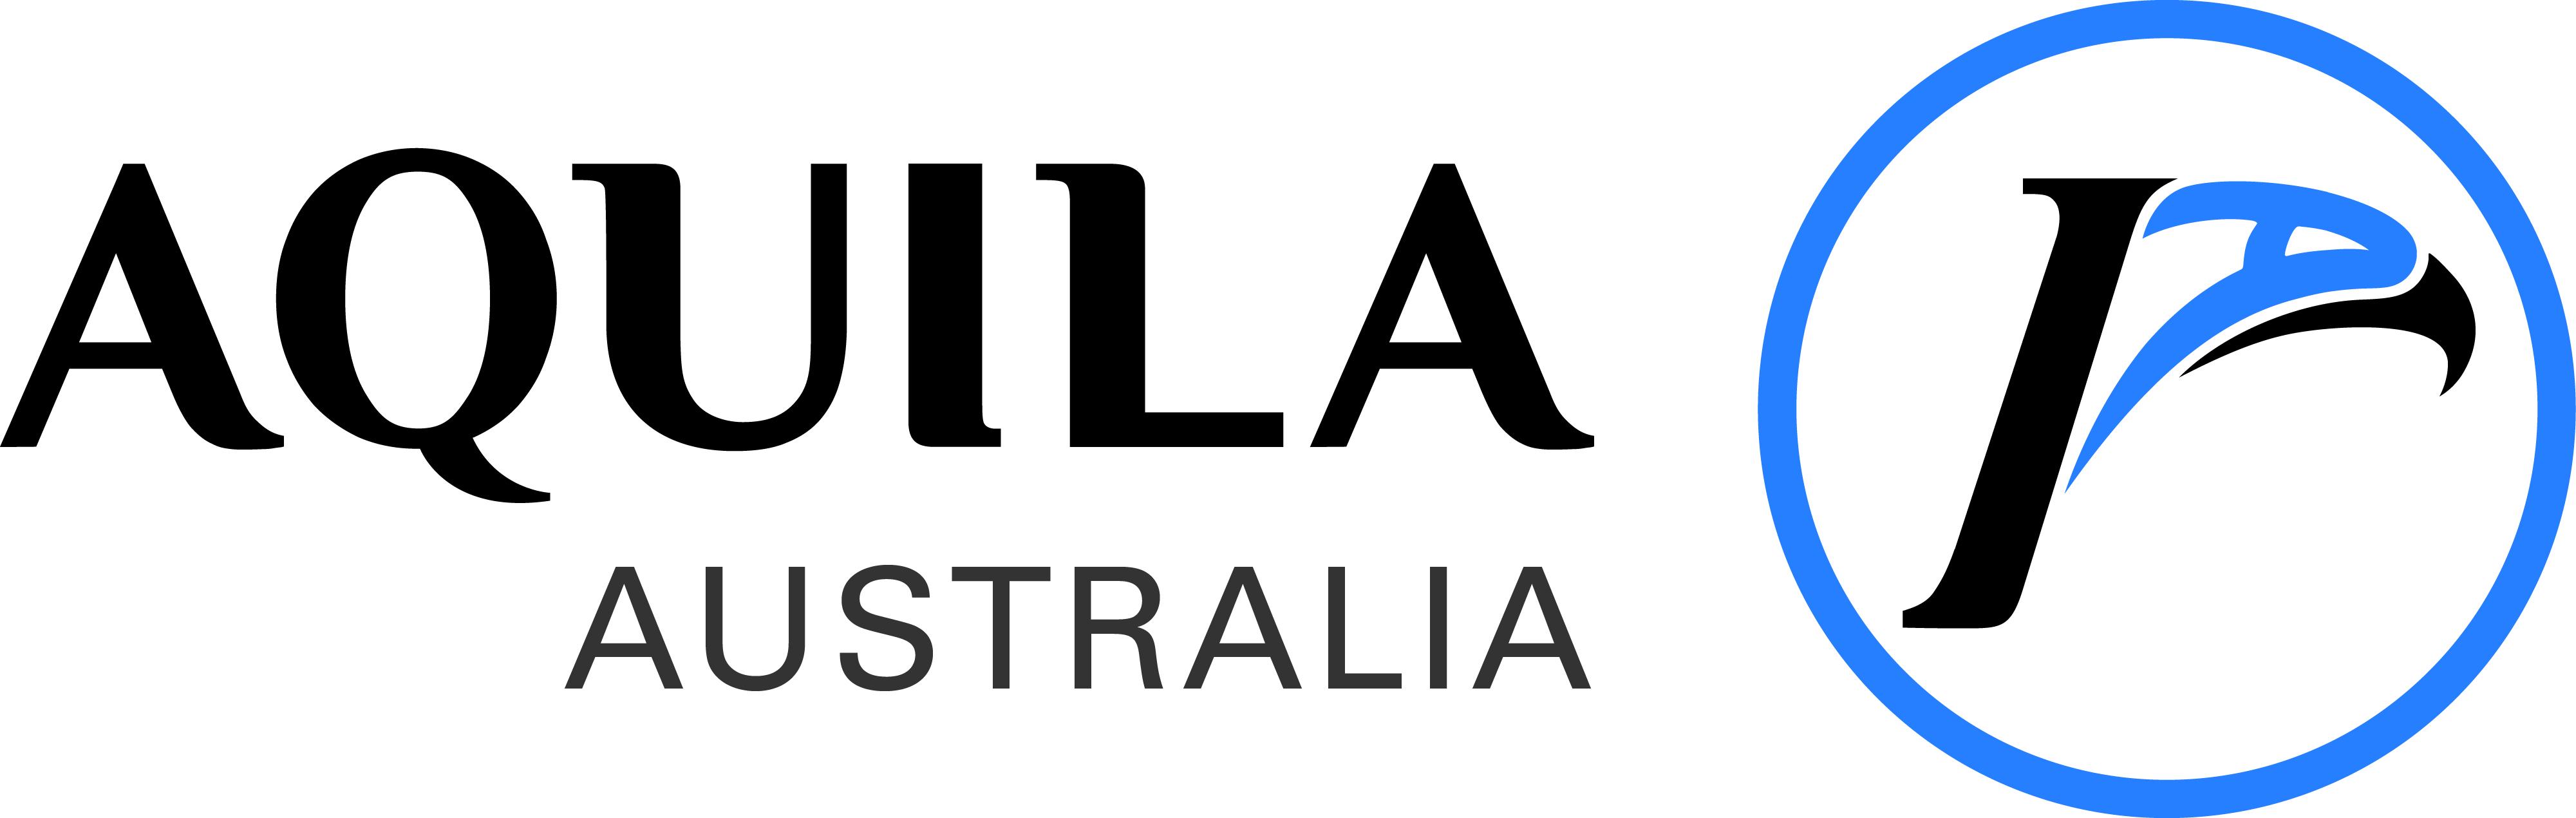 Aquila Australia